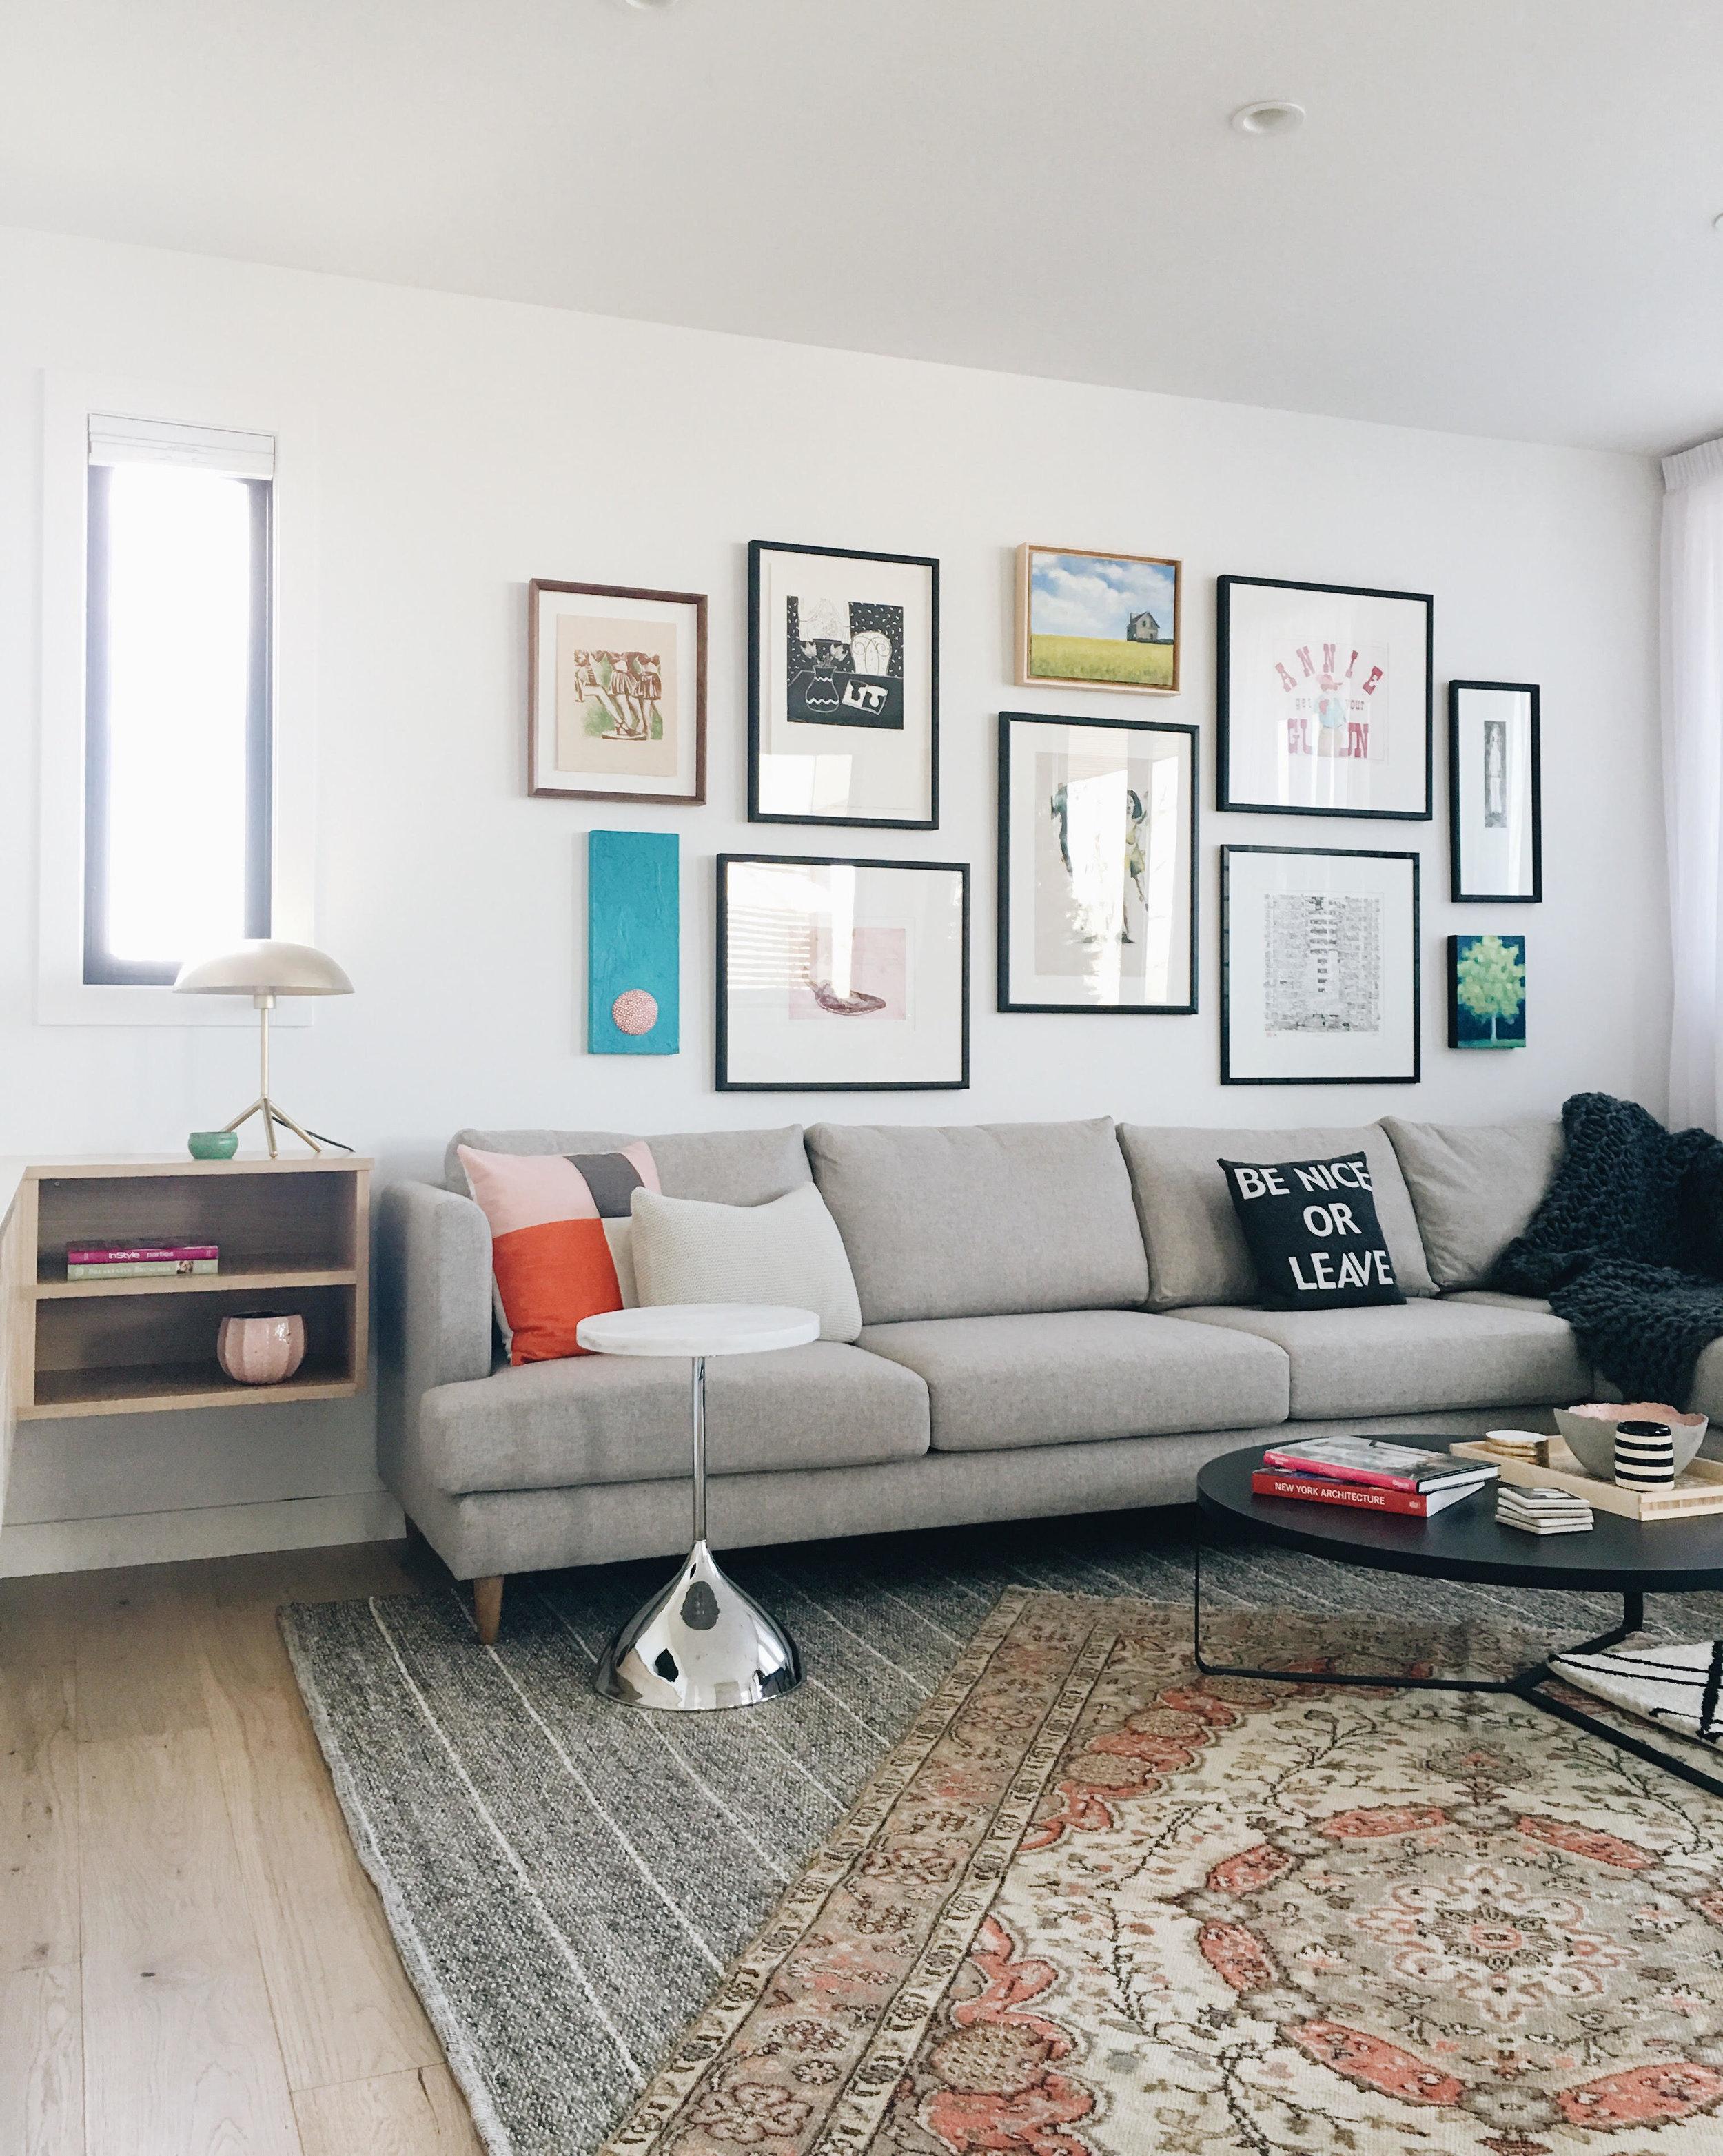 Living Room Gallery Wall, Nyla Free Designs, Calgary Interior Designer